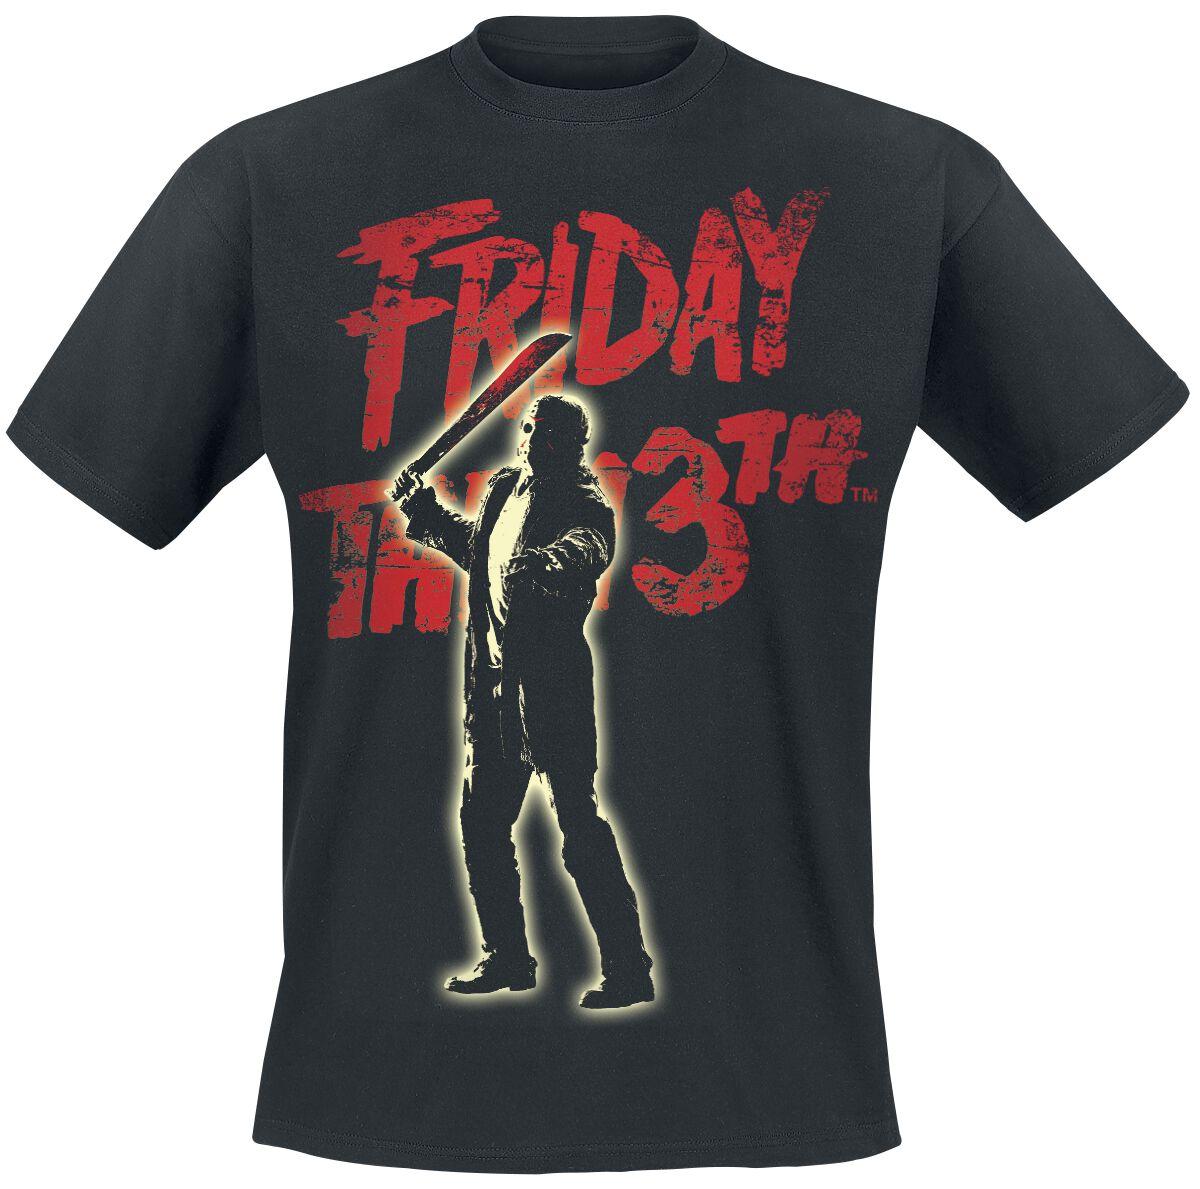 Friday The 13th Parody